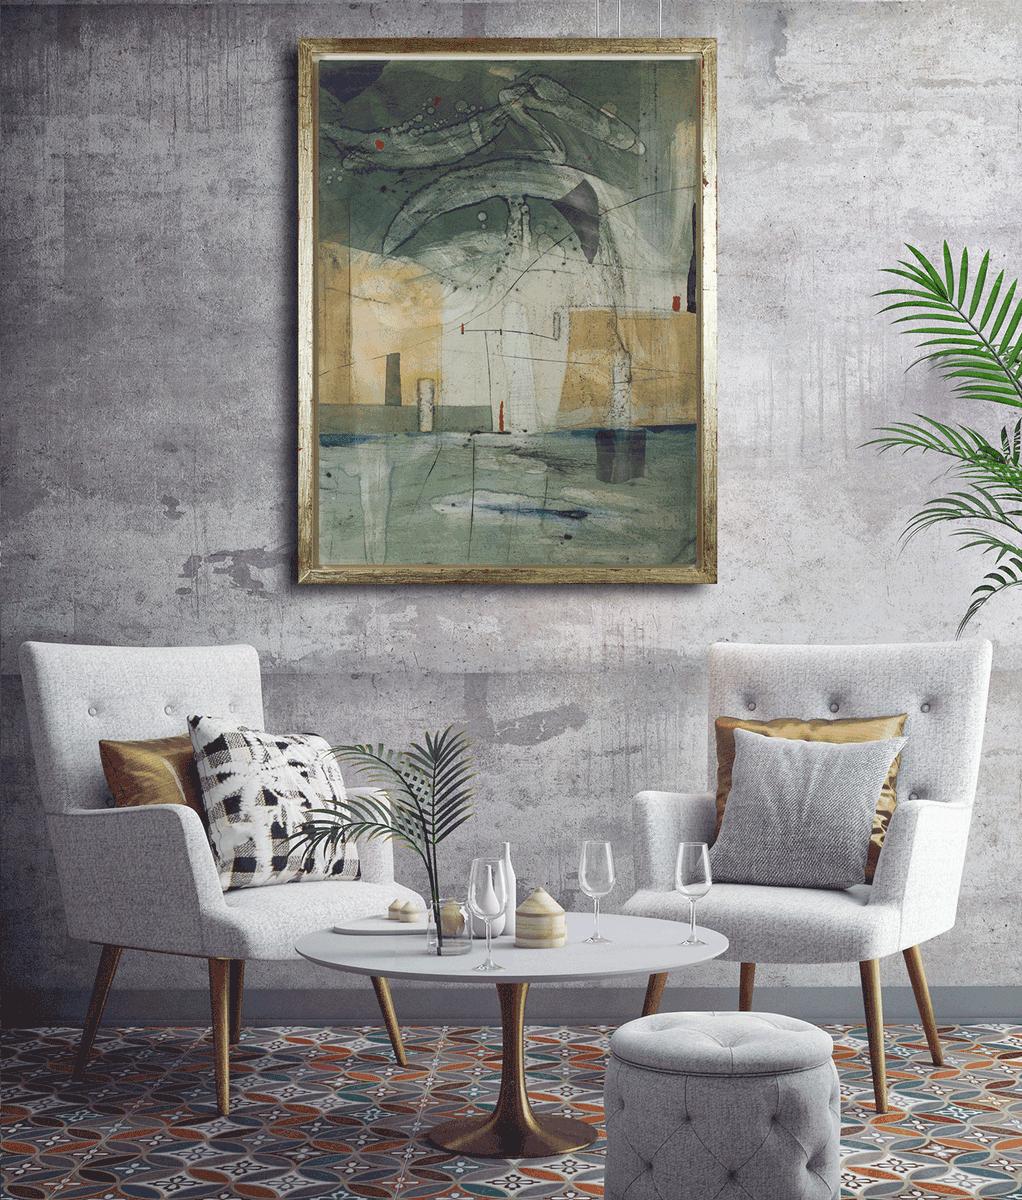 All In The Balance – 65cm x 85cm by Susan Moxley  #abstractpainting #abstractart #art #abstract #contemporaryart #painting #artist #artwork  #modernart #abstractartist #contemporarypainting #artoftheday #artgallery #artcollector #fineart #abstraction #artforsale #interiordesign https://t.co/QMMBGQBCtW